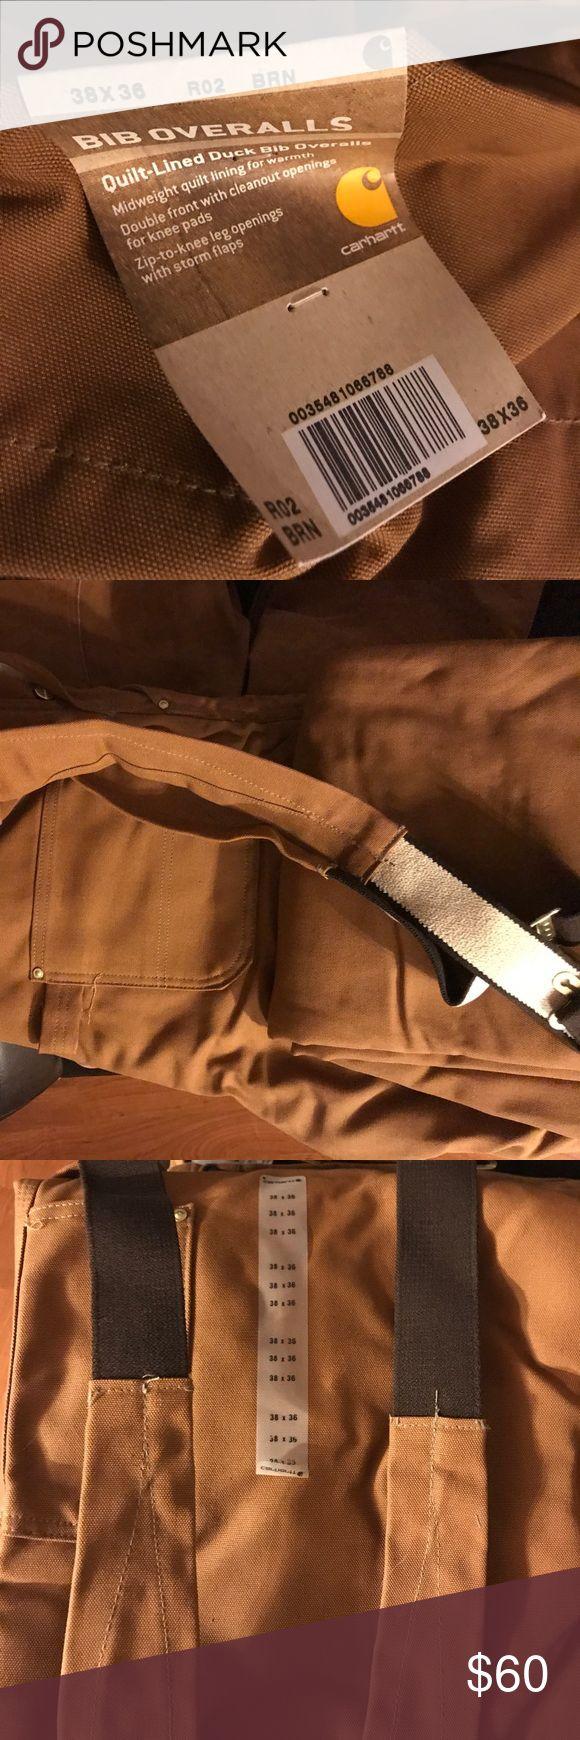 Carhartt bib overalls Brand new quilt lined duck bib overalls Carhartt Other